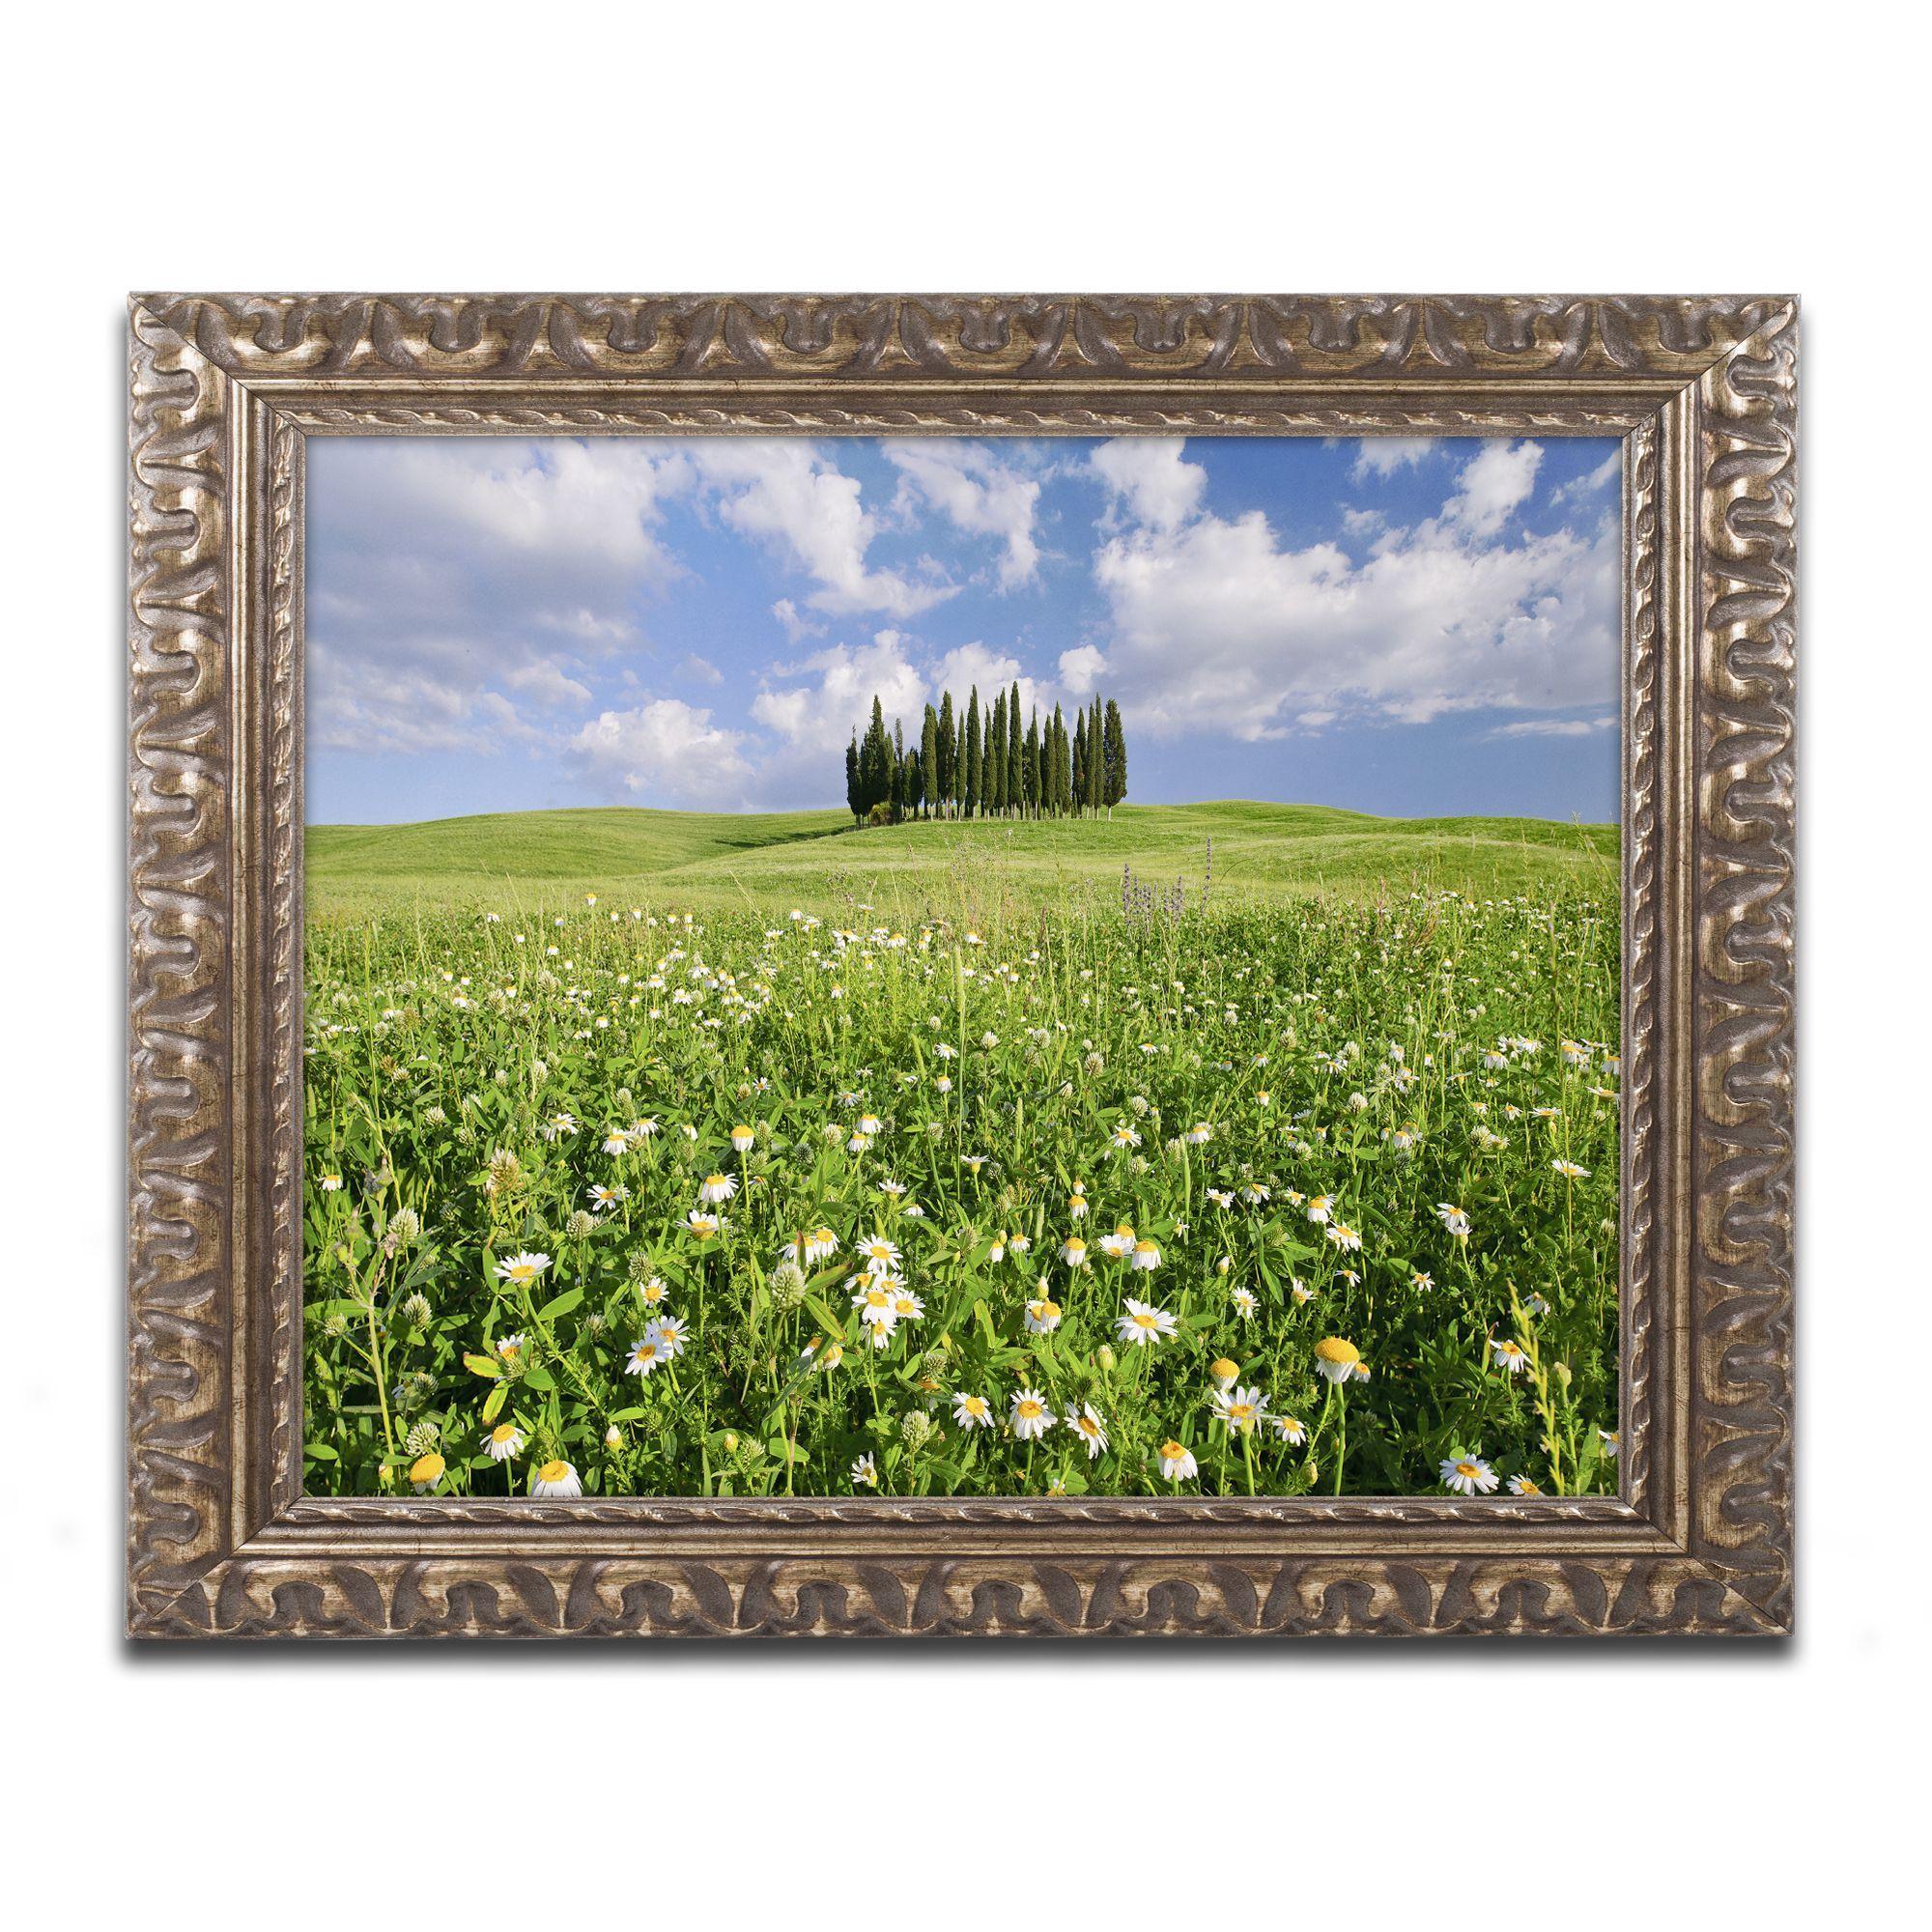 Michael Blanchette Photography 'Cypress Hill' Ornate Framed Art